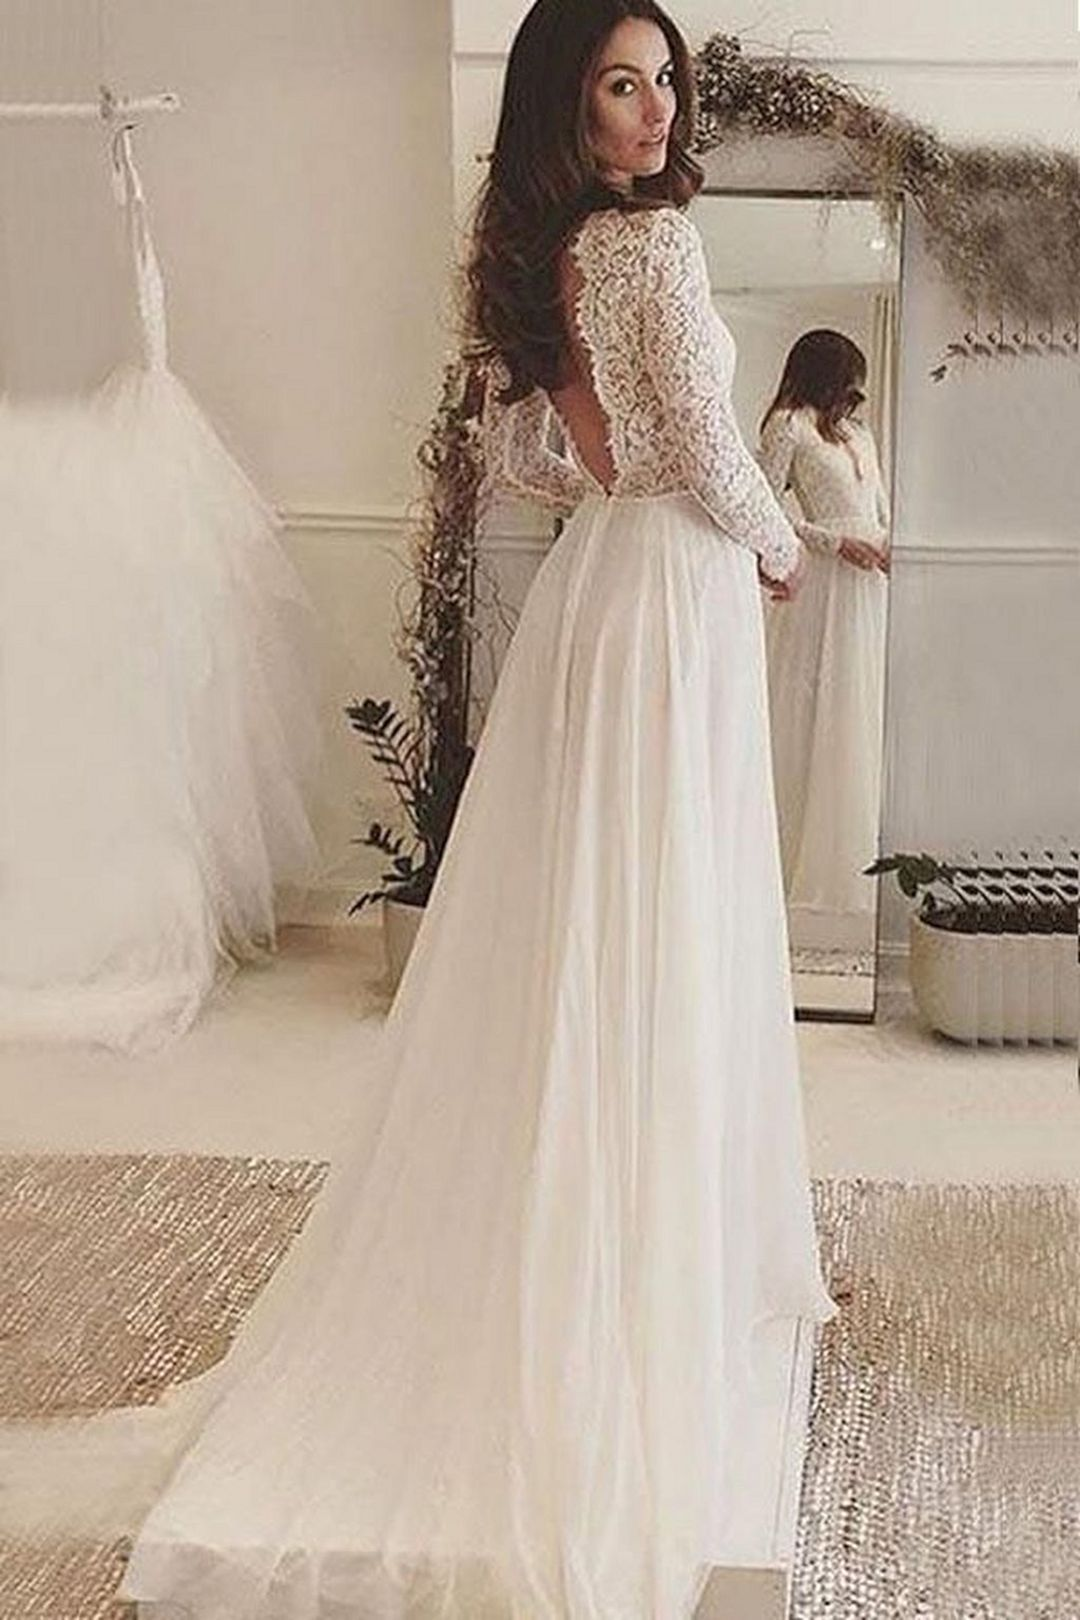 20 Awesome Rustic Wedding Dresses Ideas You Will Love It Wedding Dress Train Long Sleeve Wedding Dress Backless Backless Wedding Dress [ 1620 x 1080 Pixel ]